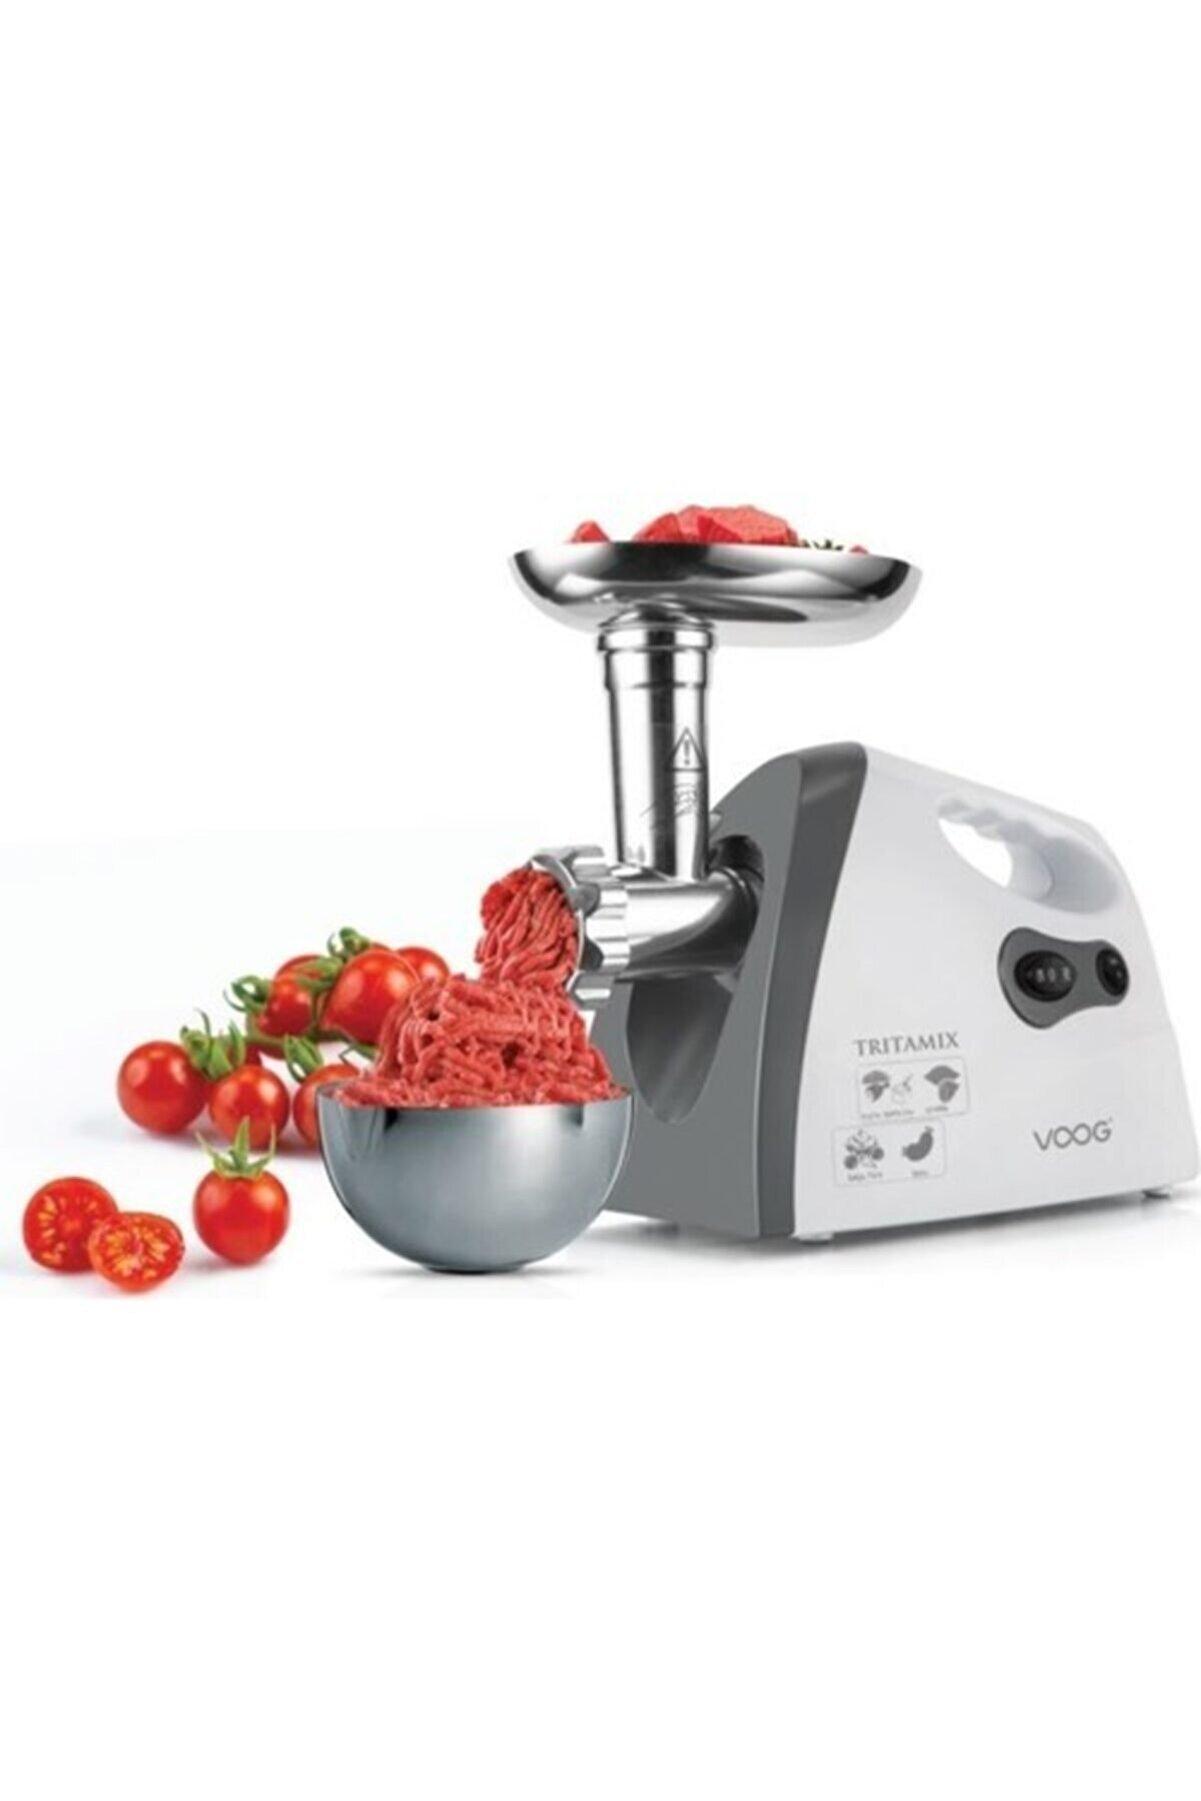 HARLEM Gurme Elektrikli Kıyma Makinesi Et Sosis Sucuk Aleti 2200w